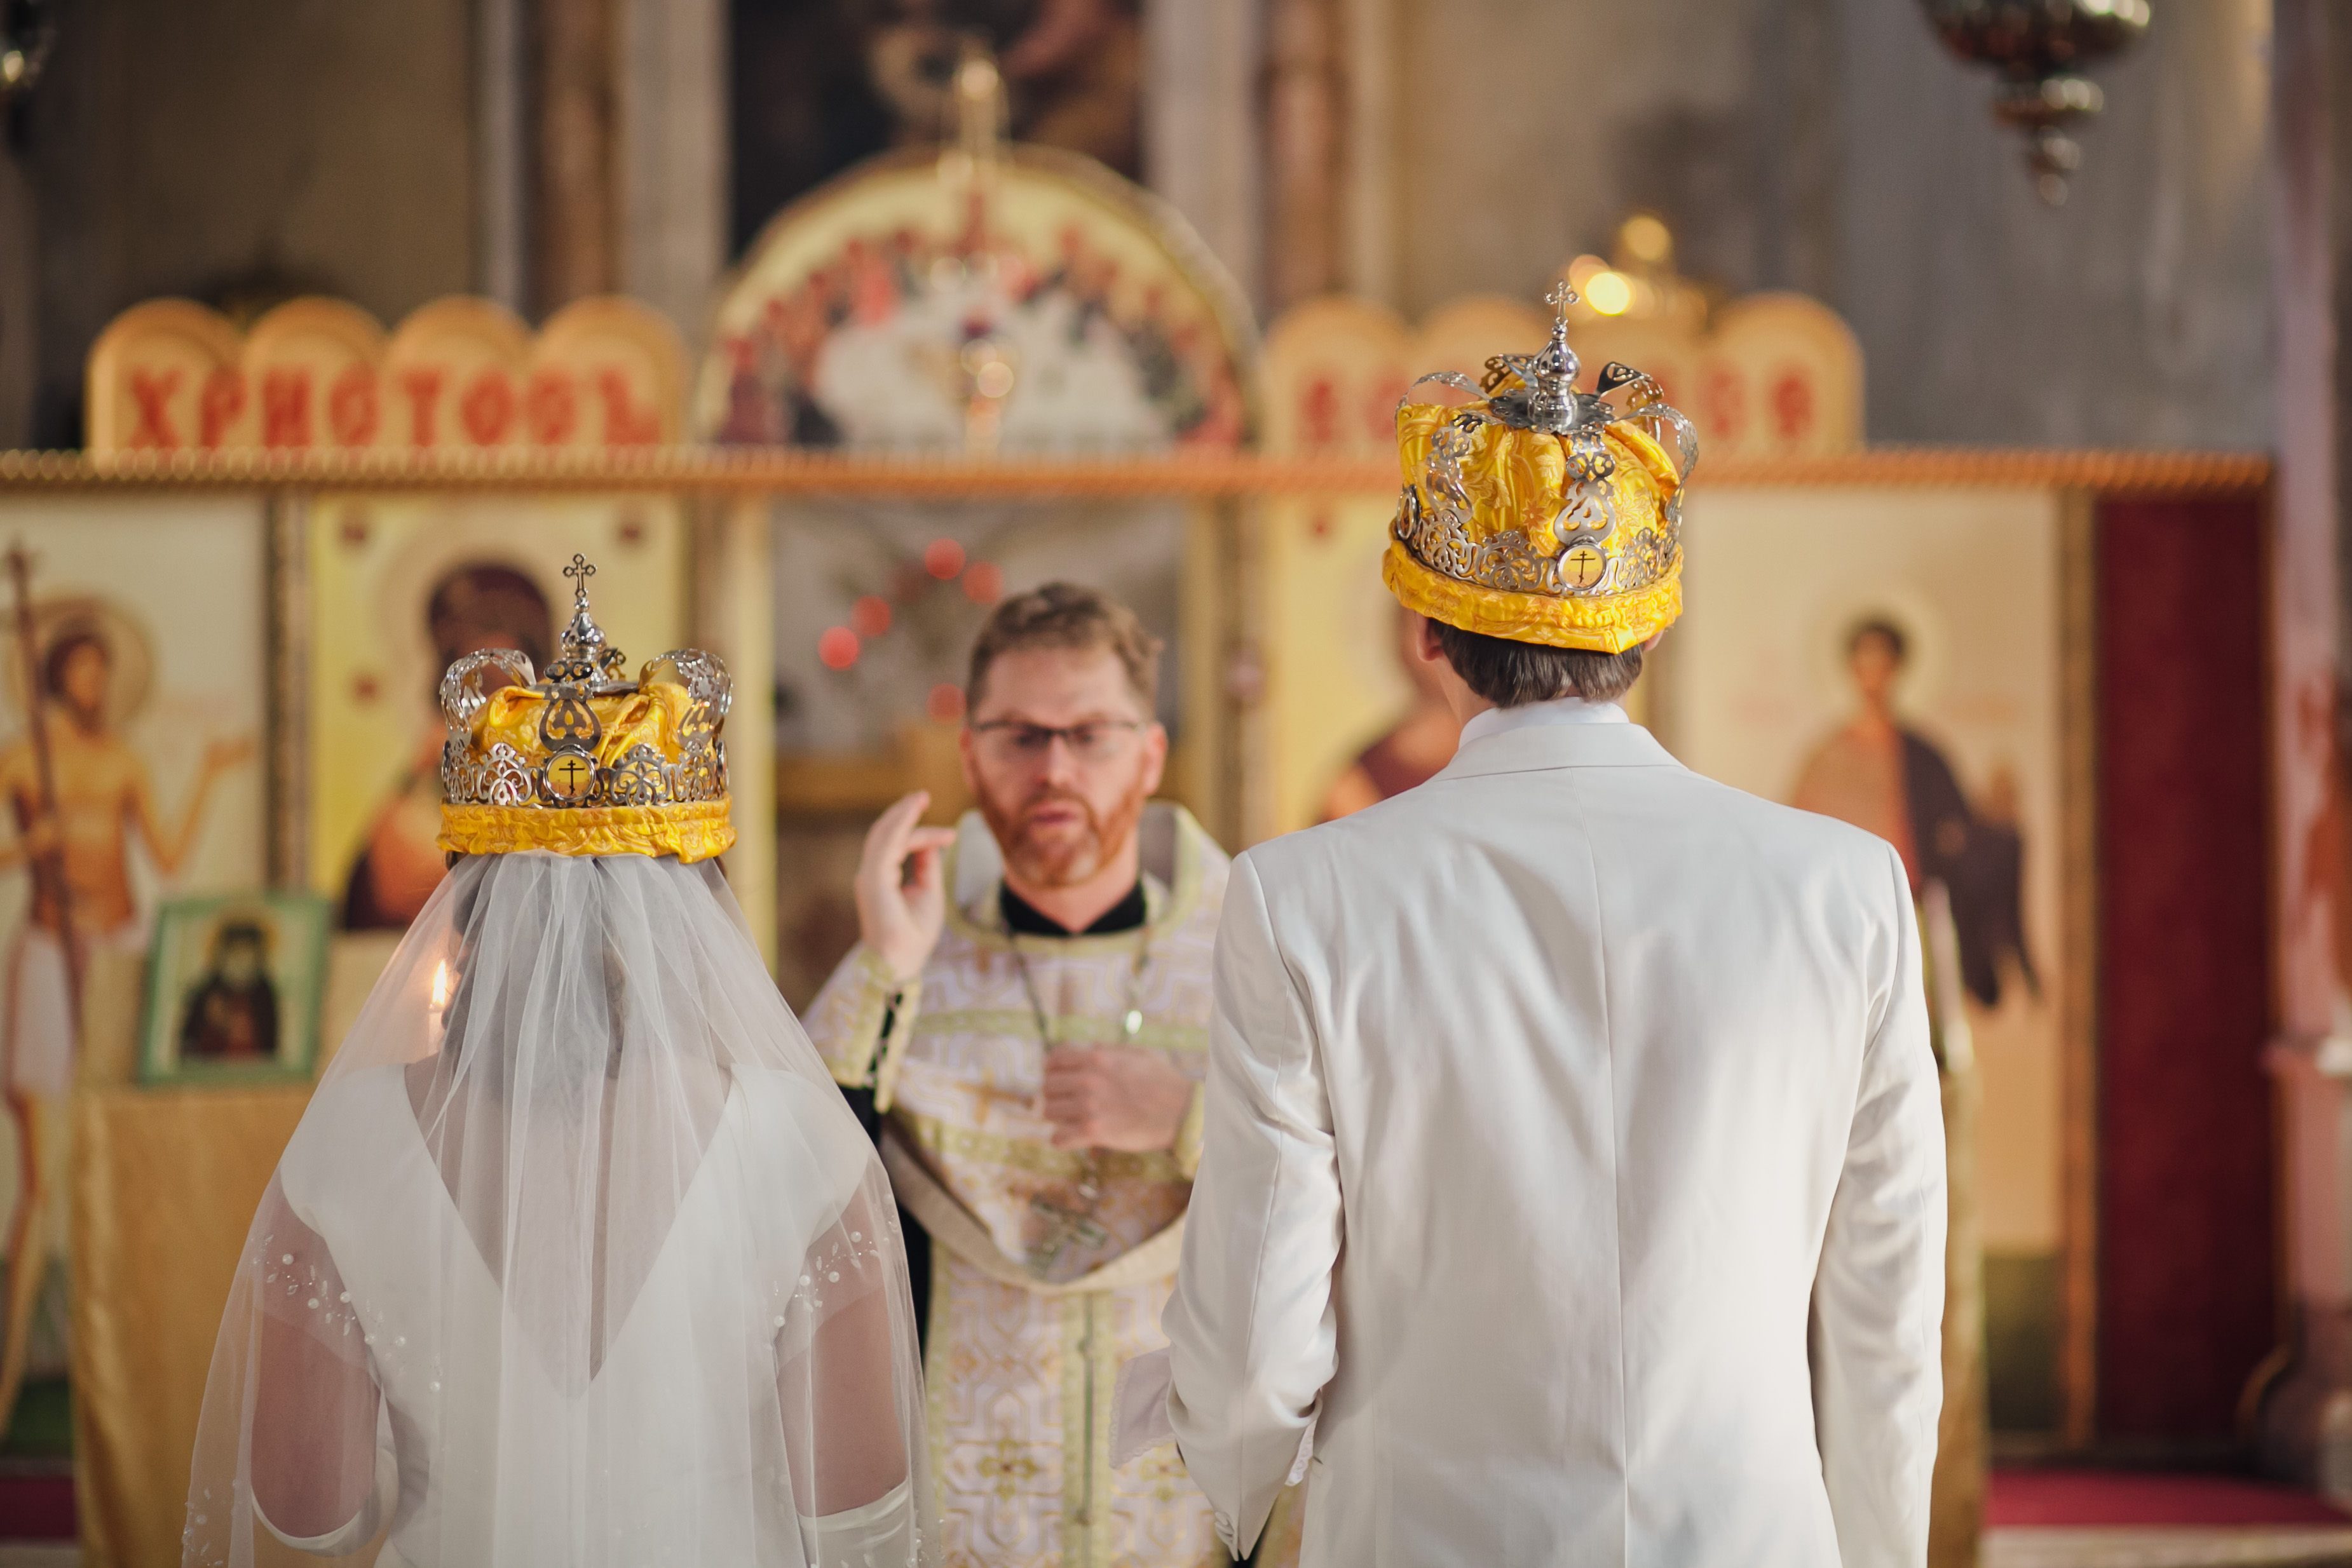 древности отмечали картинки про венчания обычно варанаси проблем